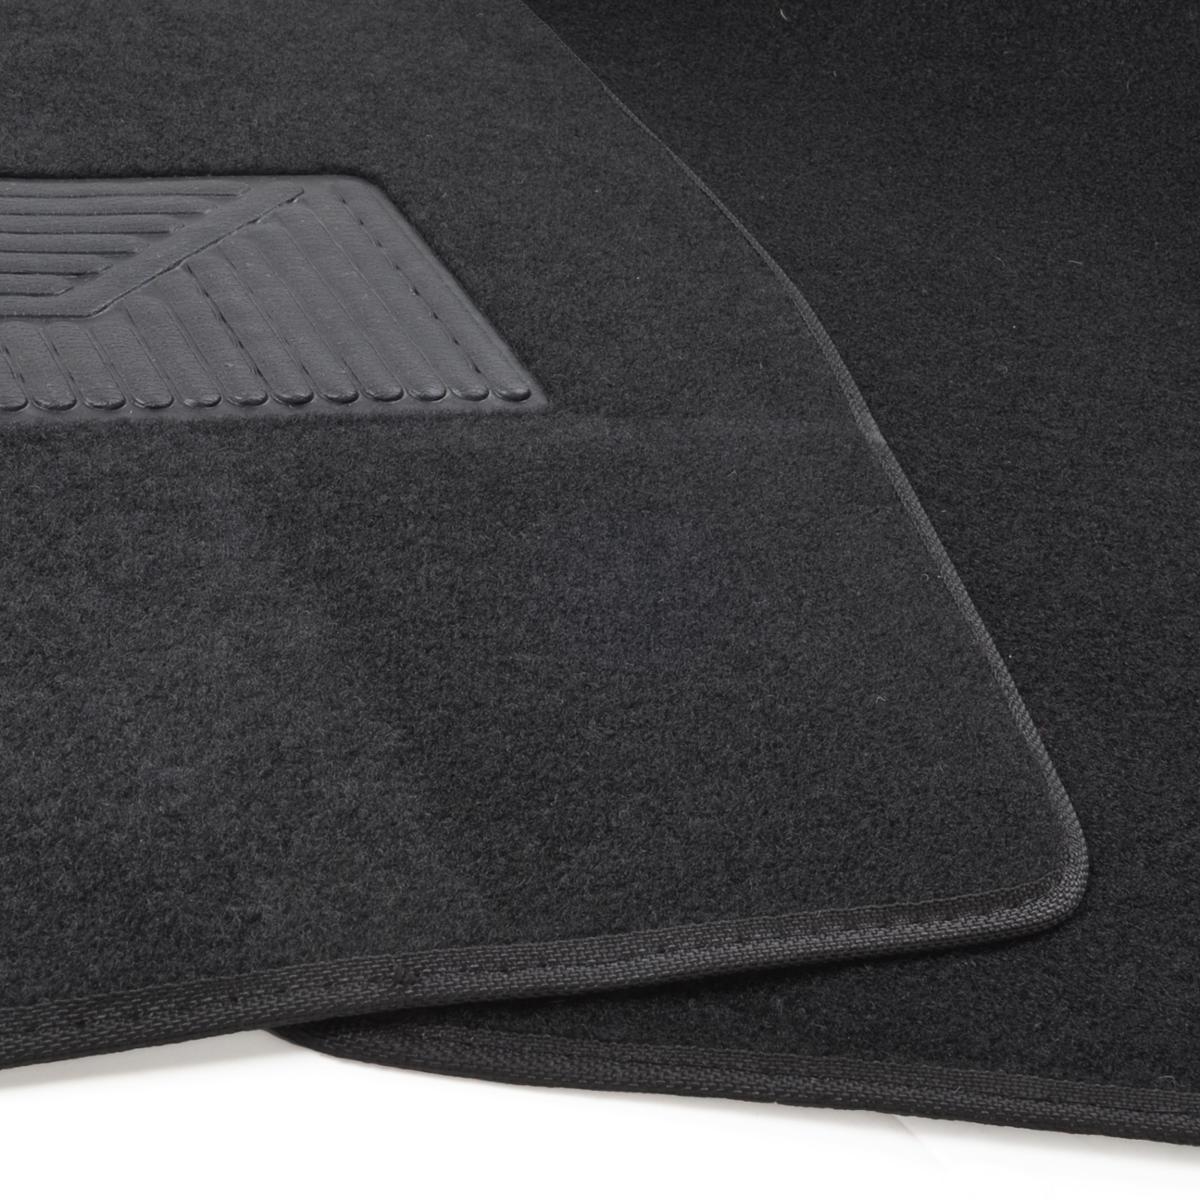 3pc Set Black Heavy Duty Carpet Suv Van Pickup Car Floor